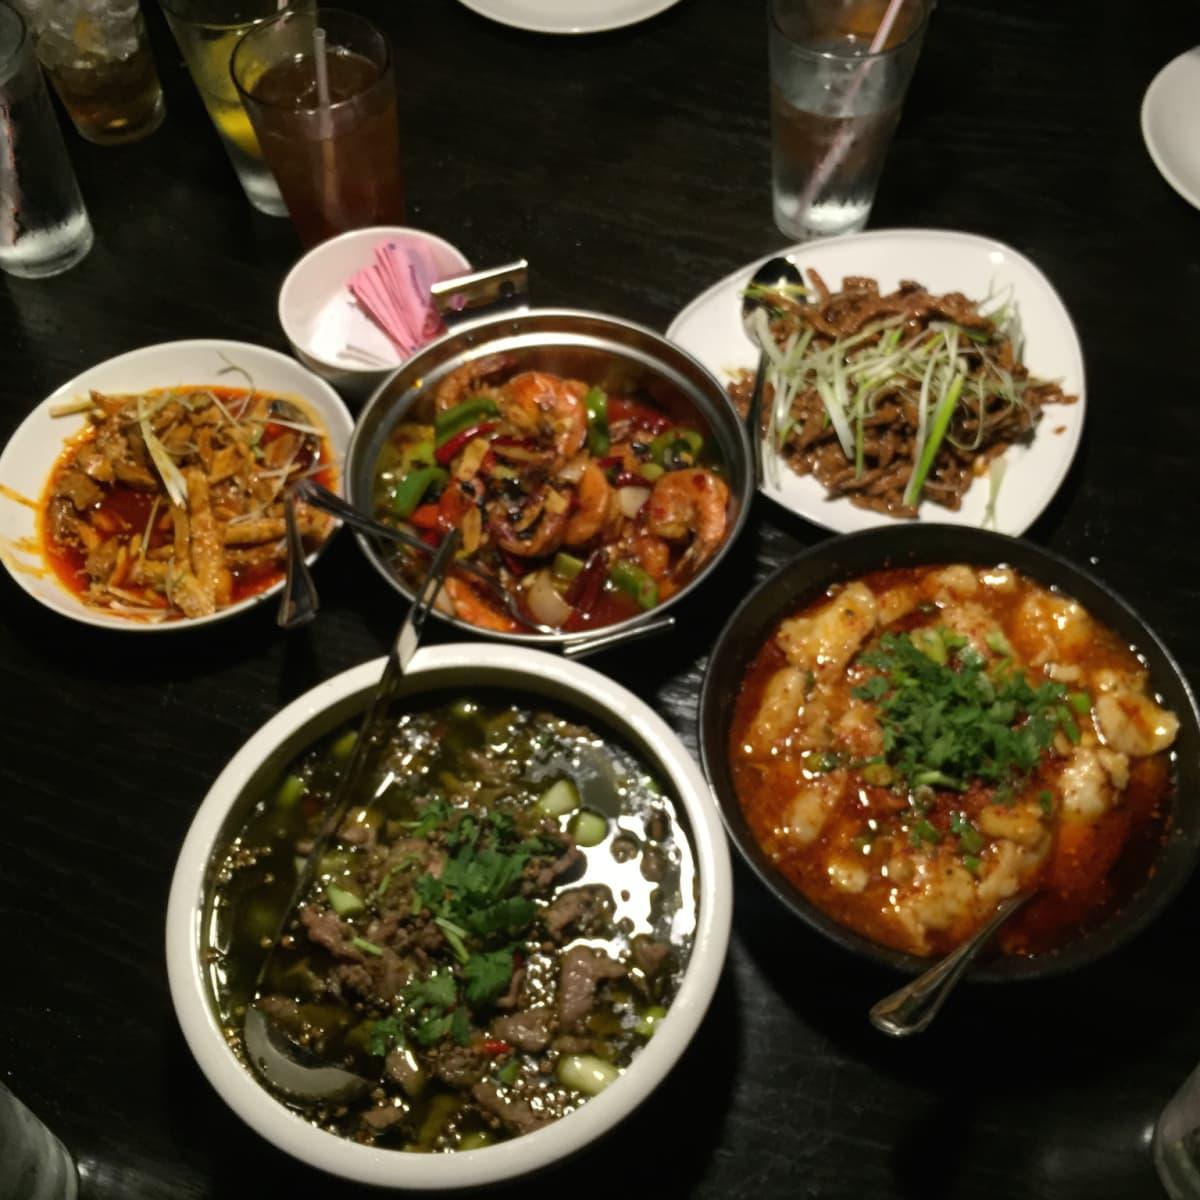 Mala Sichuan dishes